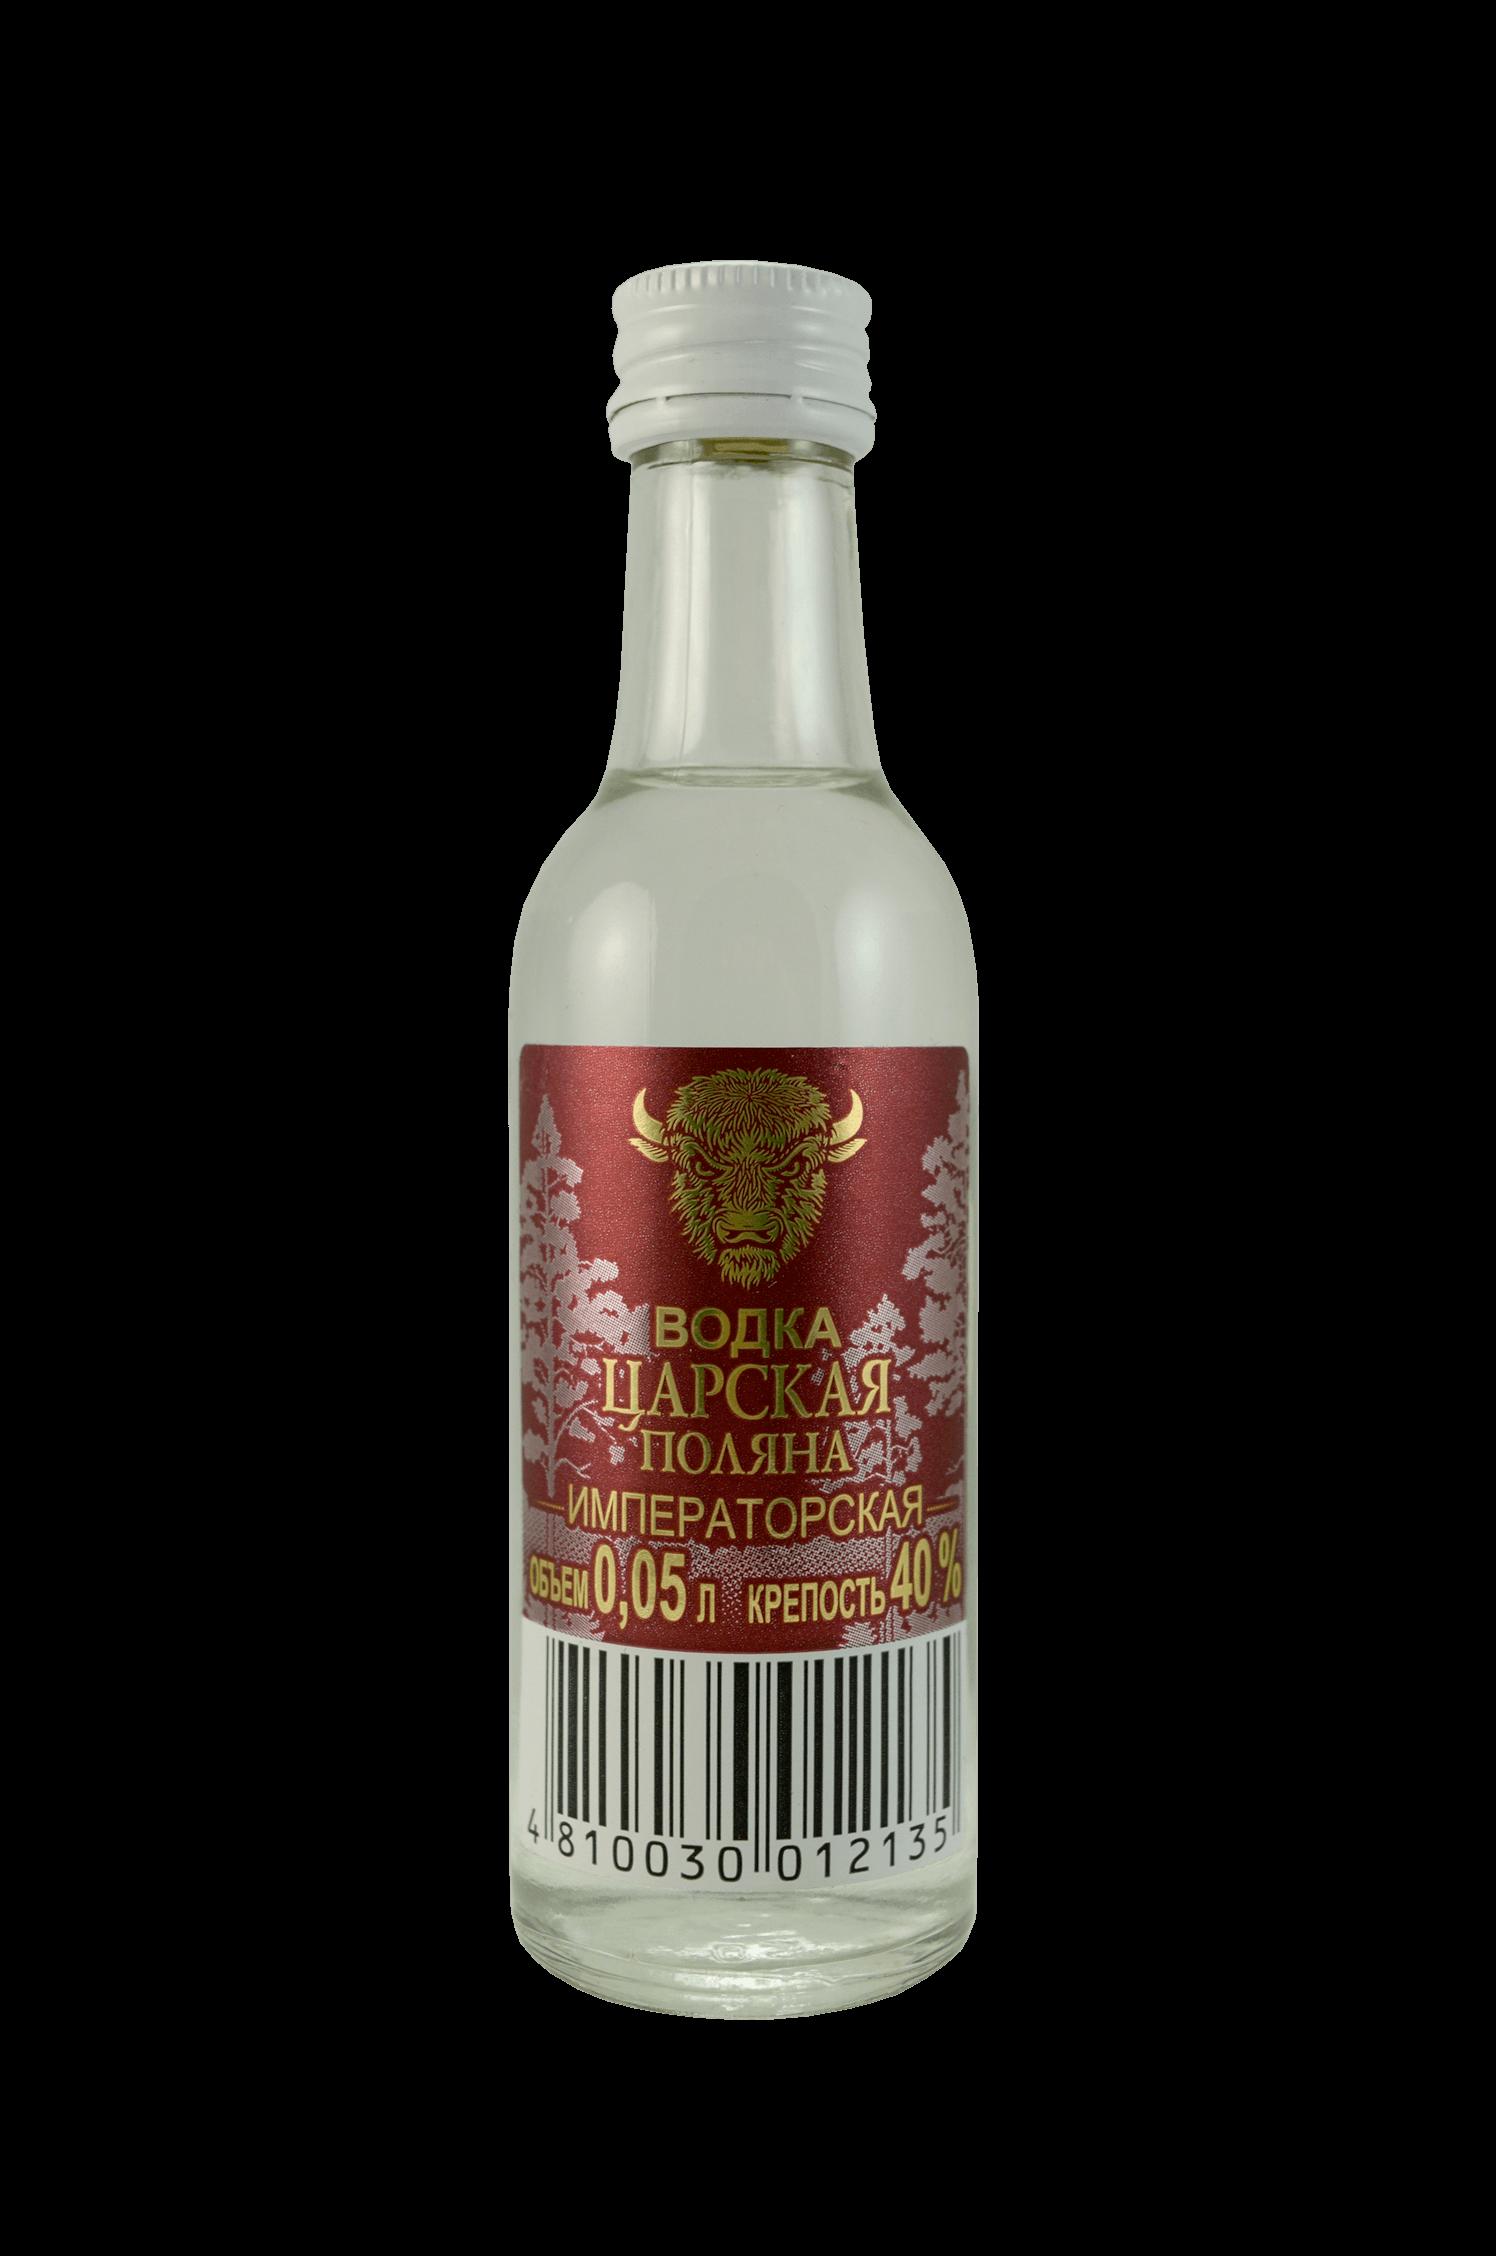 Vodka Carskaya Imperatorskaya